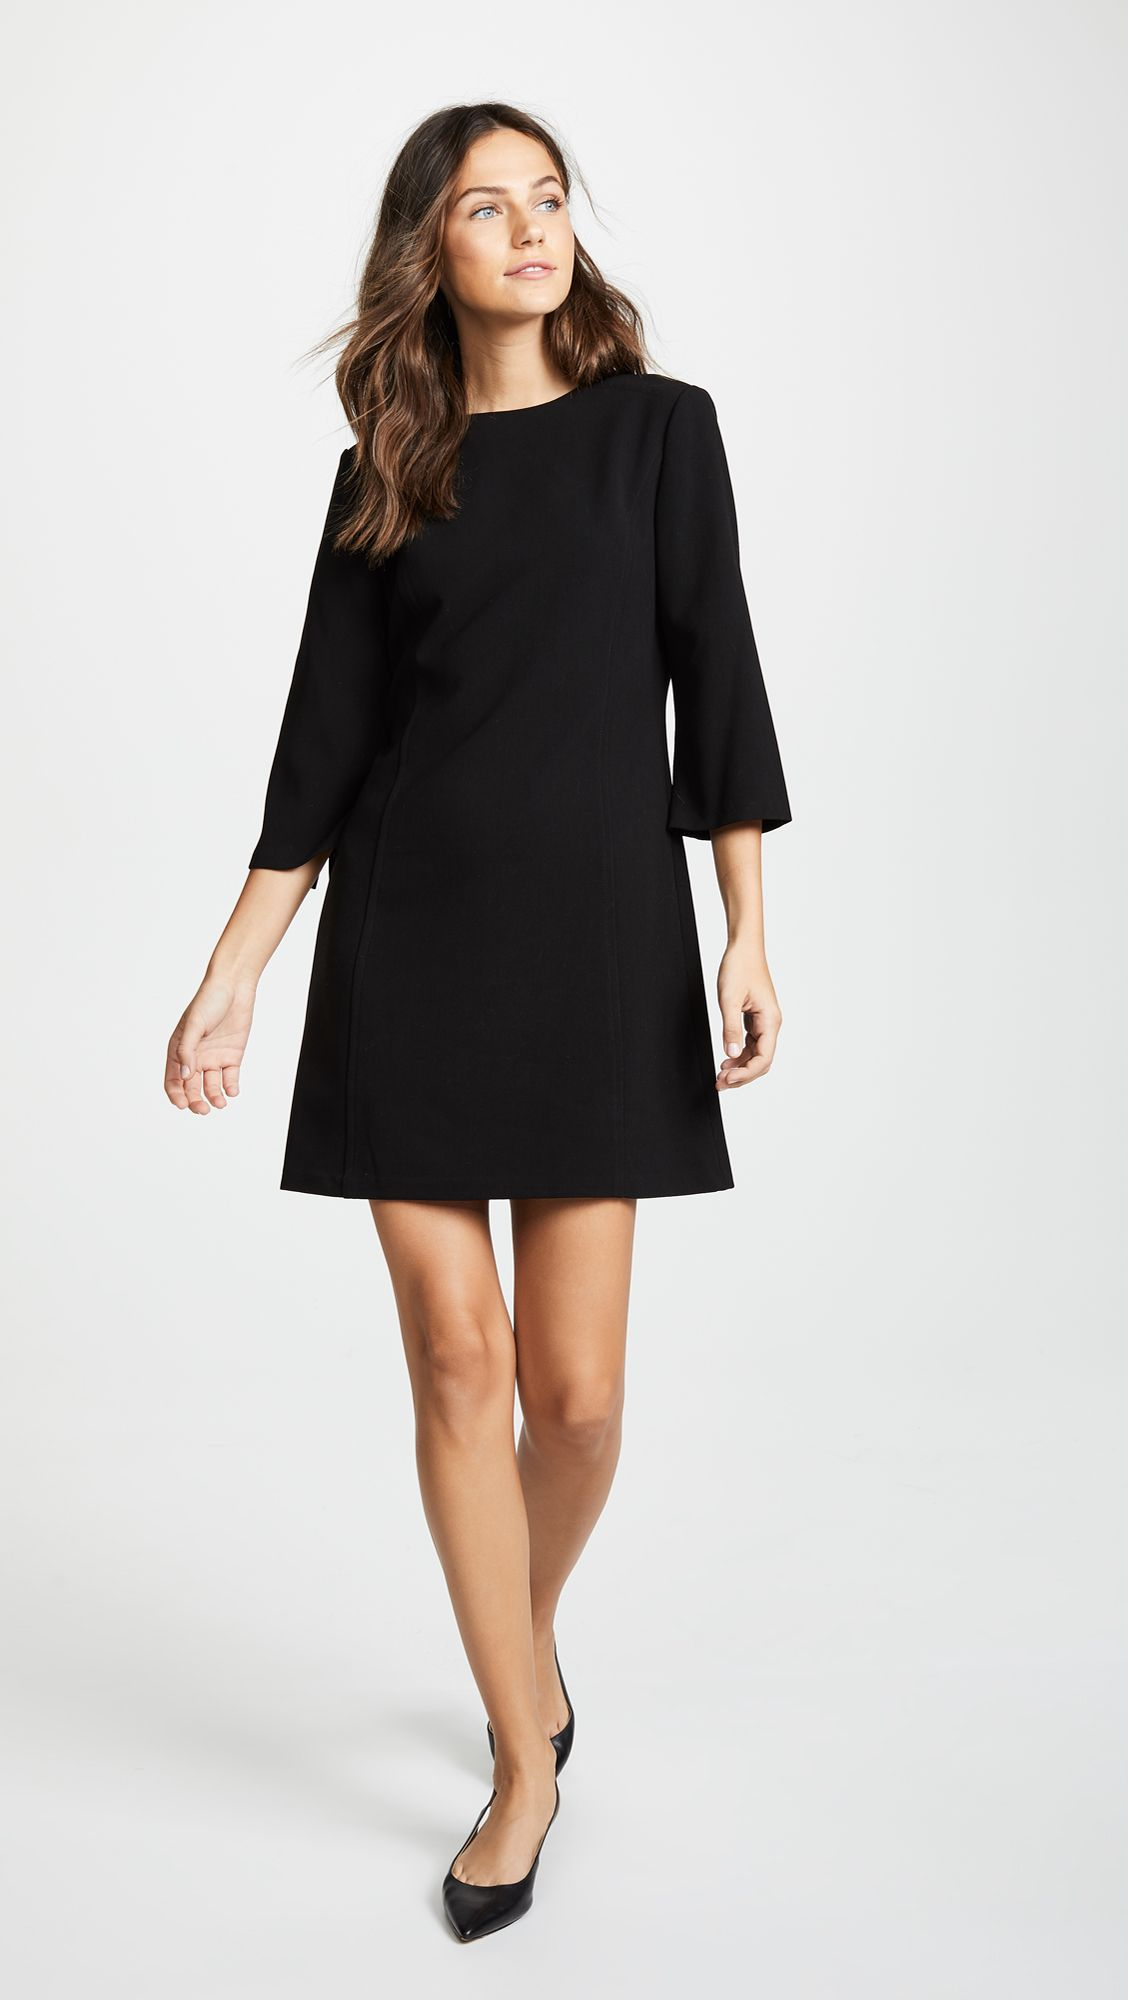 Alice Olivia Gem 3 4 Sleeve Shift Dress Shopbop Shift Dress Day To Night Dresses Dresses [ 2000 x 1128 Pixel ]